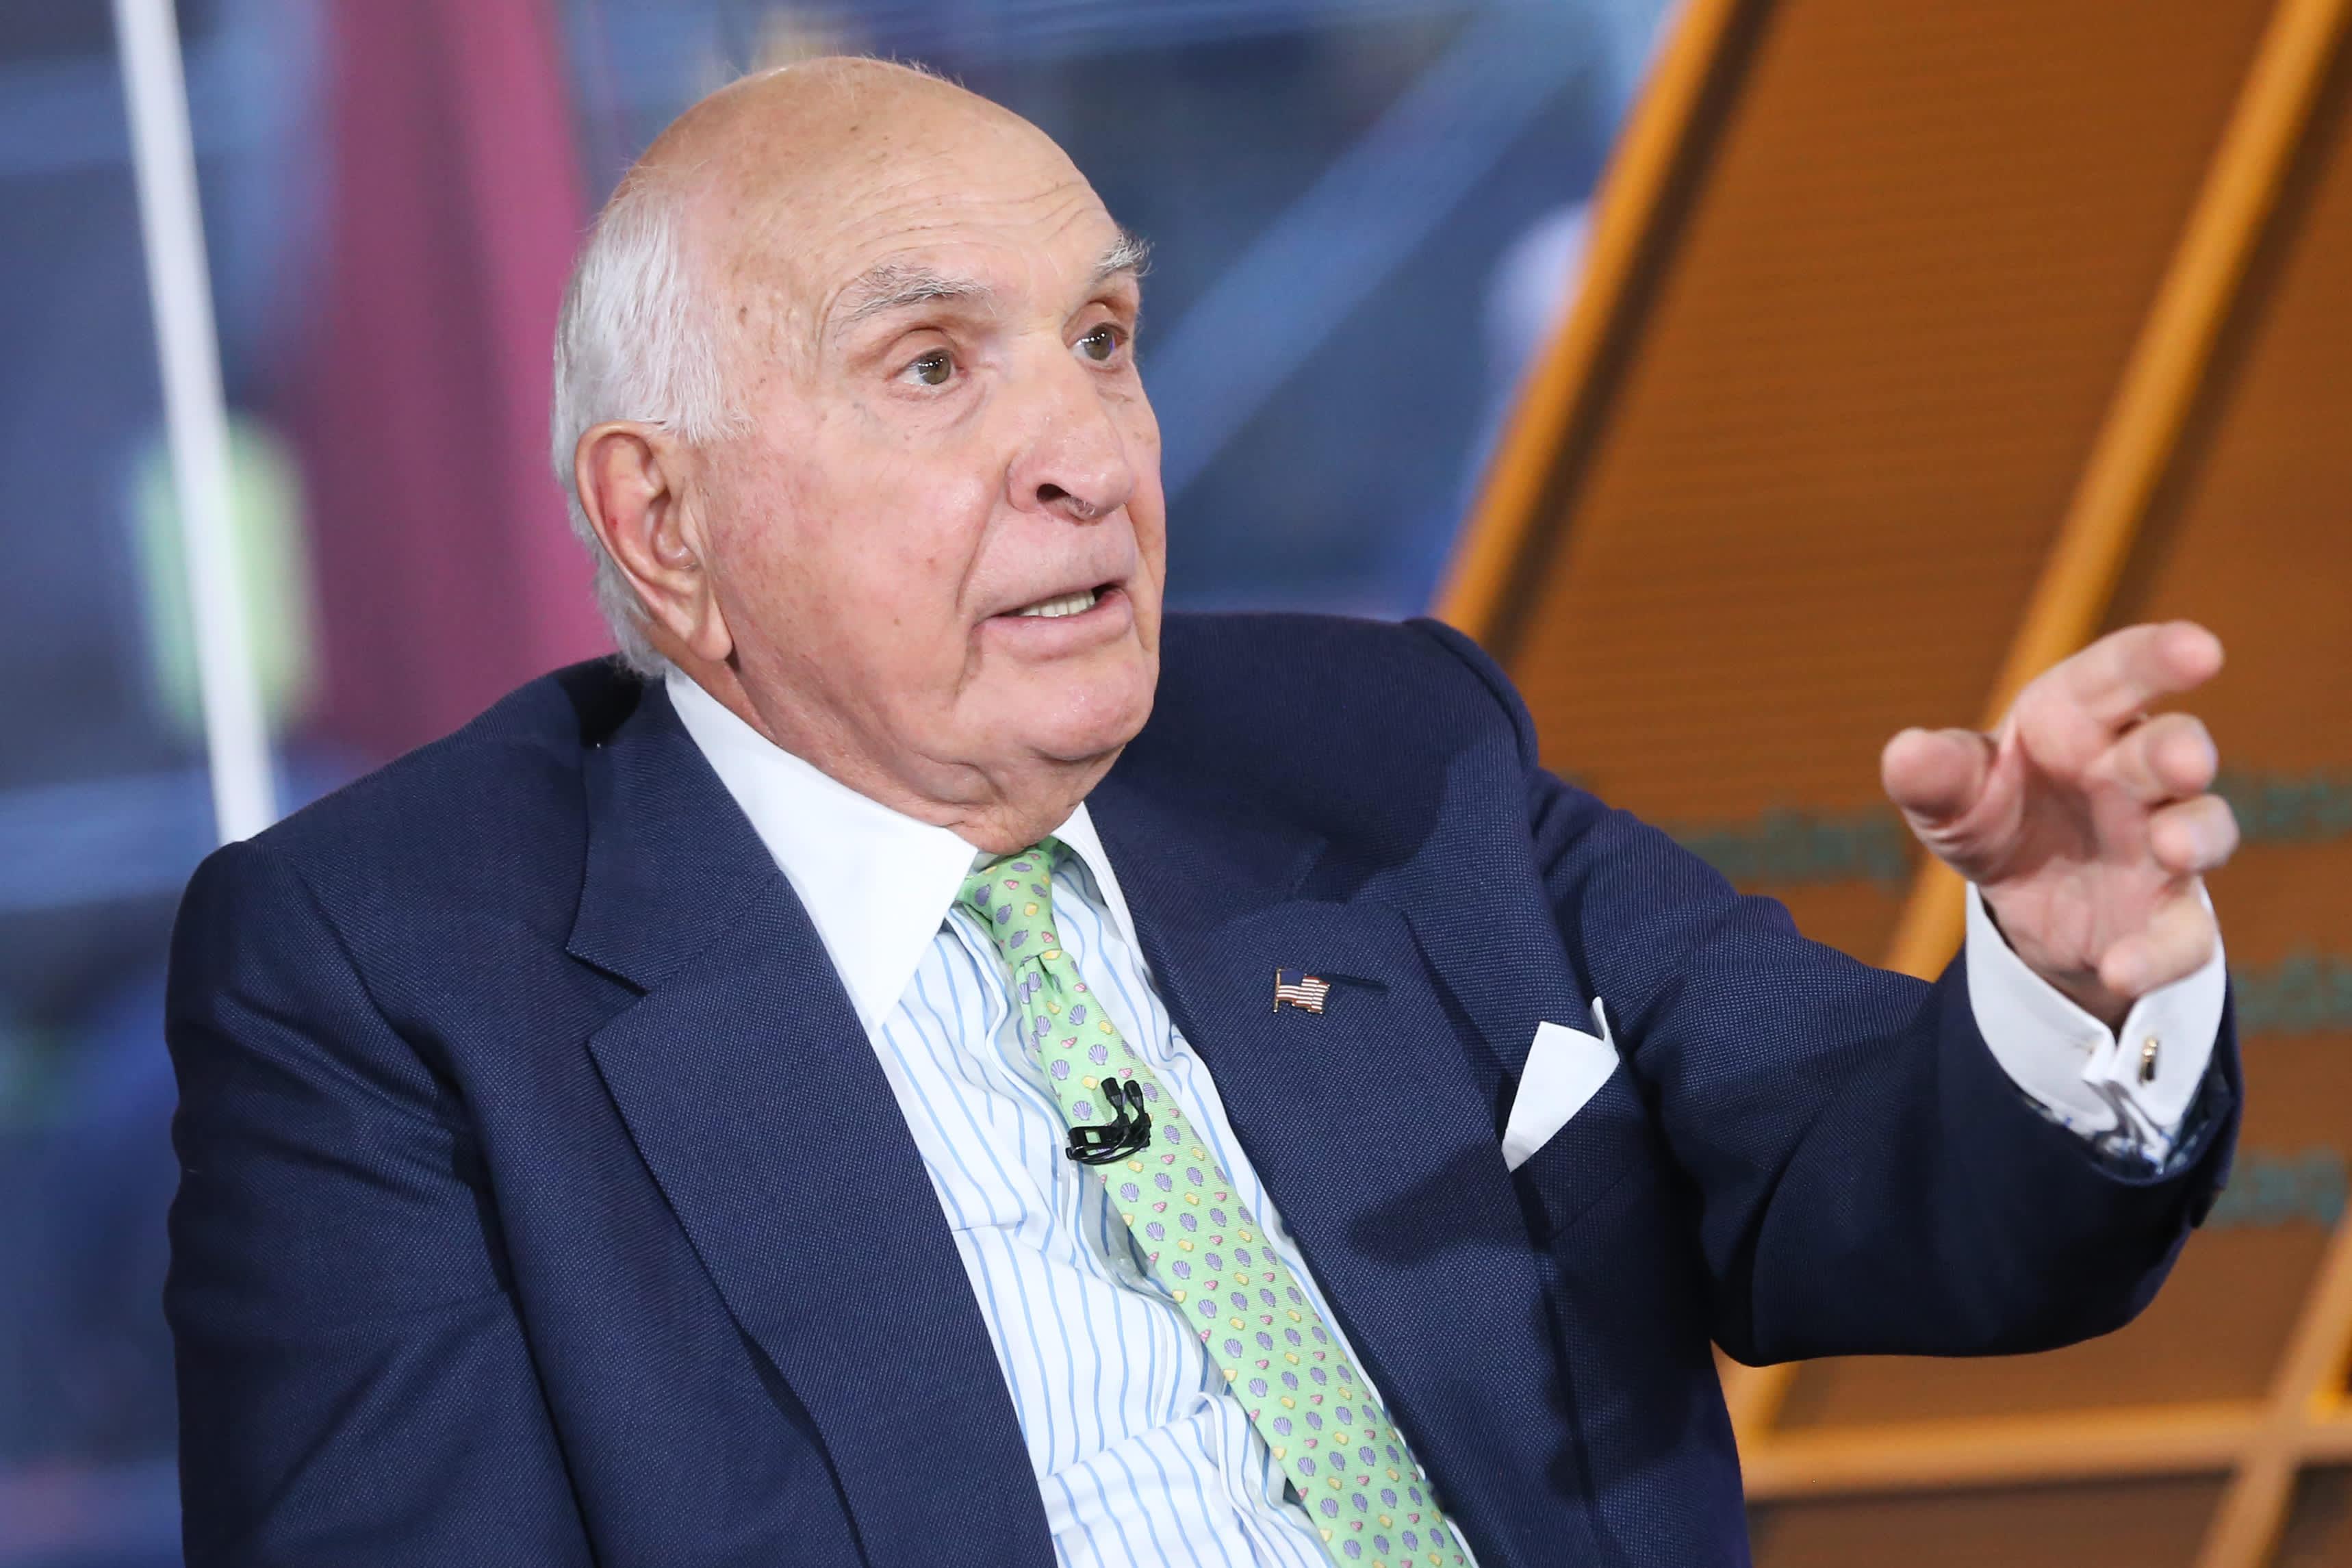 Billionaire businessman Ken Langone talks about stocks he likes, including JP Morgan and GE